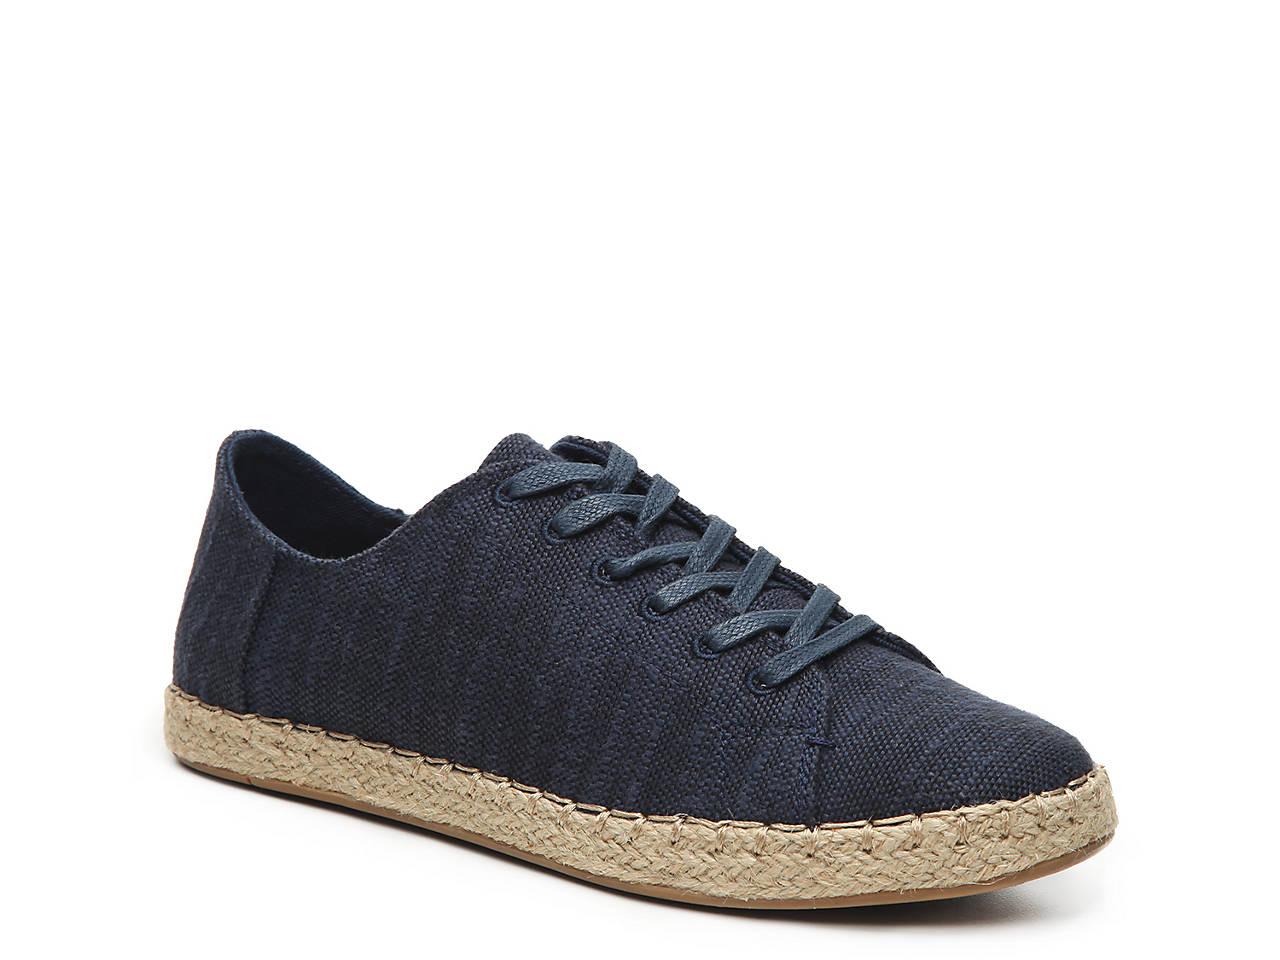 9264a9f4166 TOMS Lena Espadrille Sneaker Women s Shoes